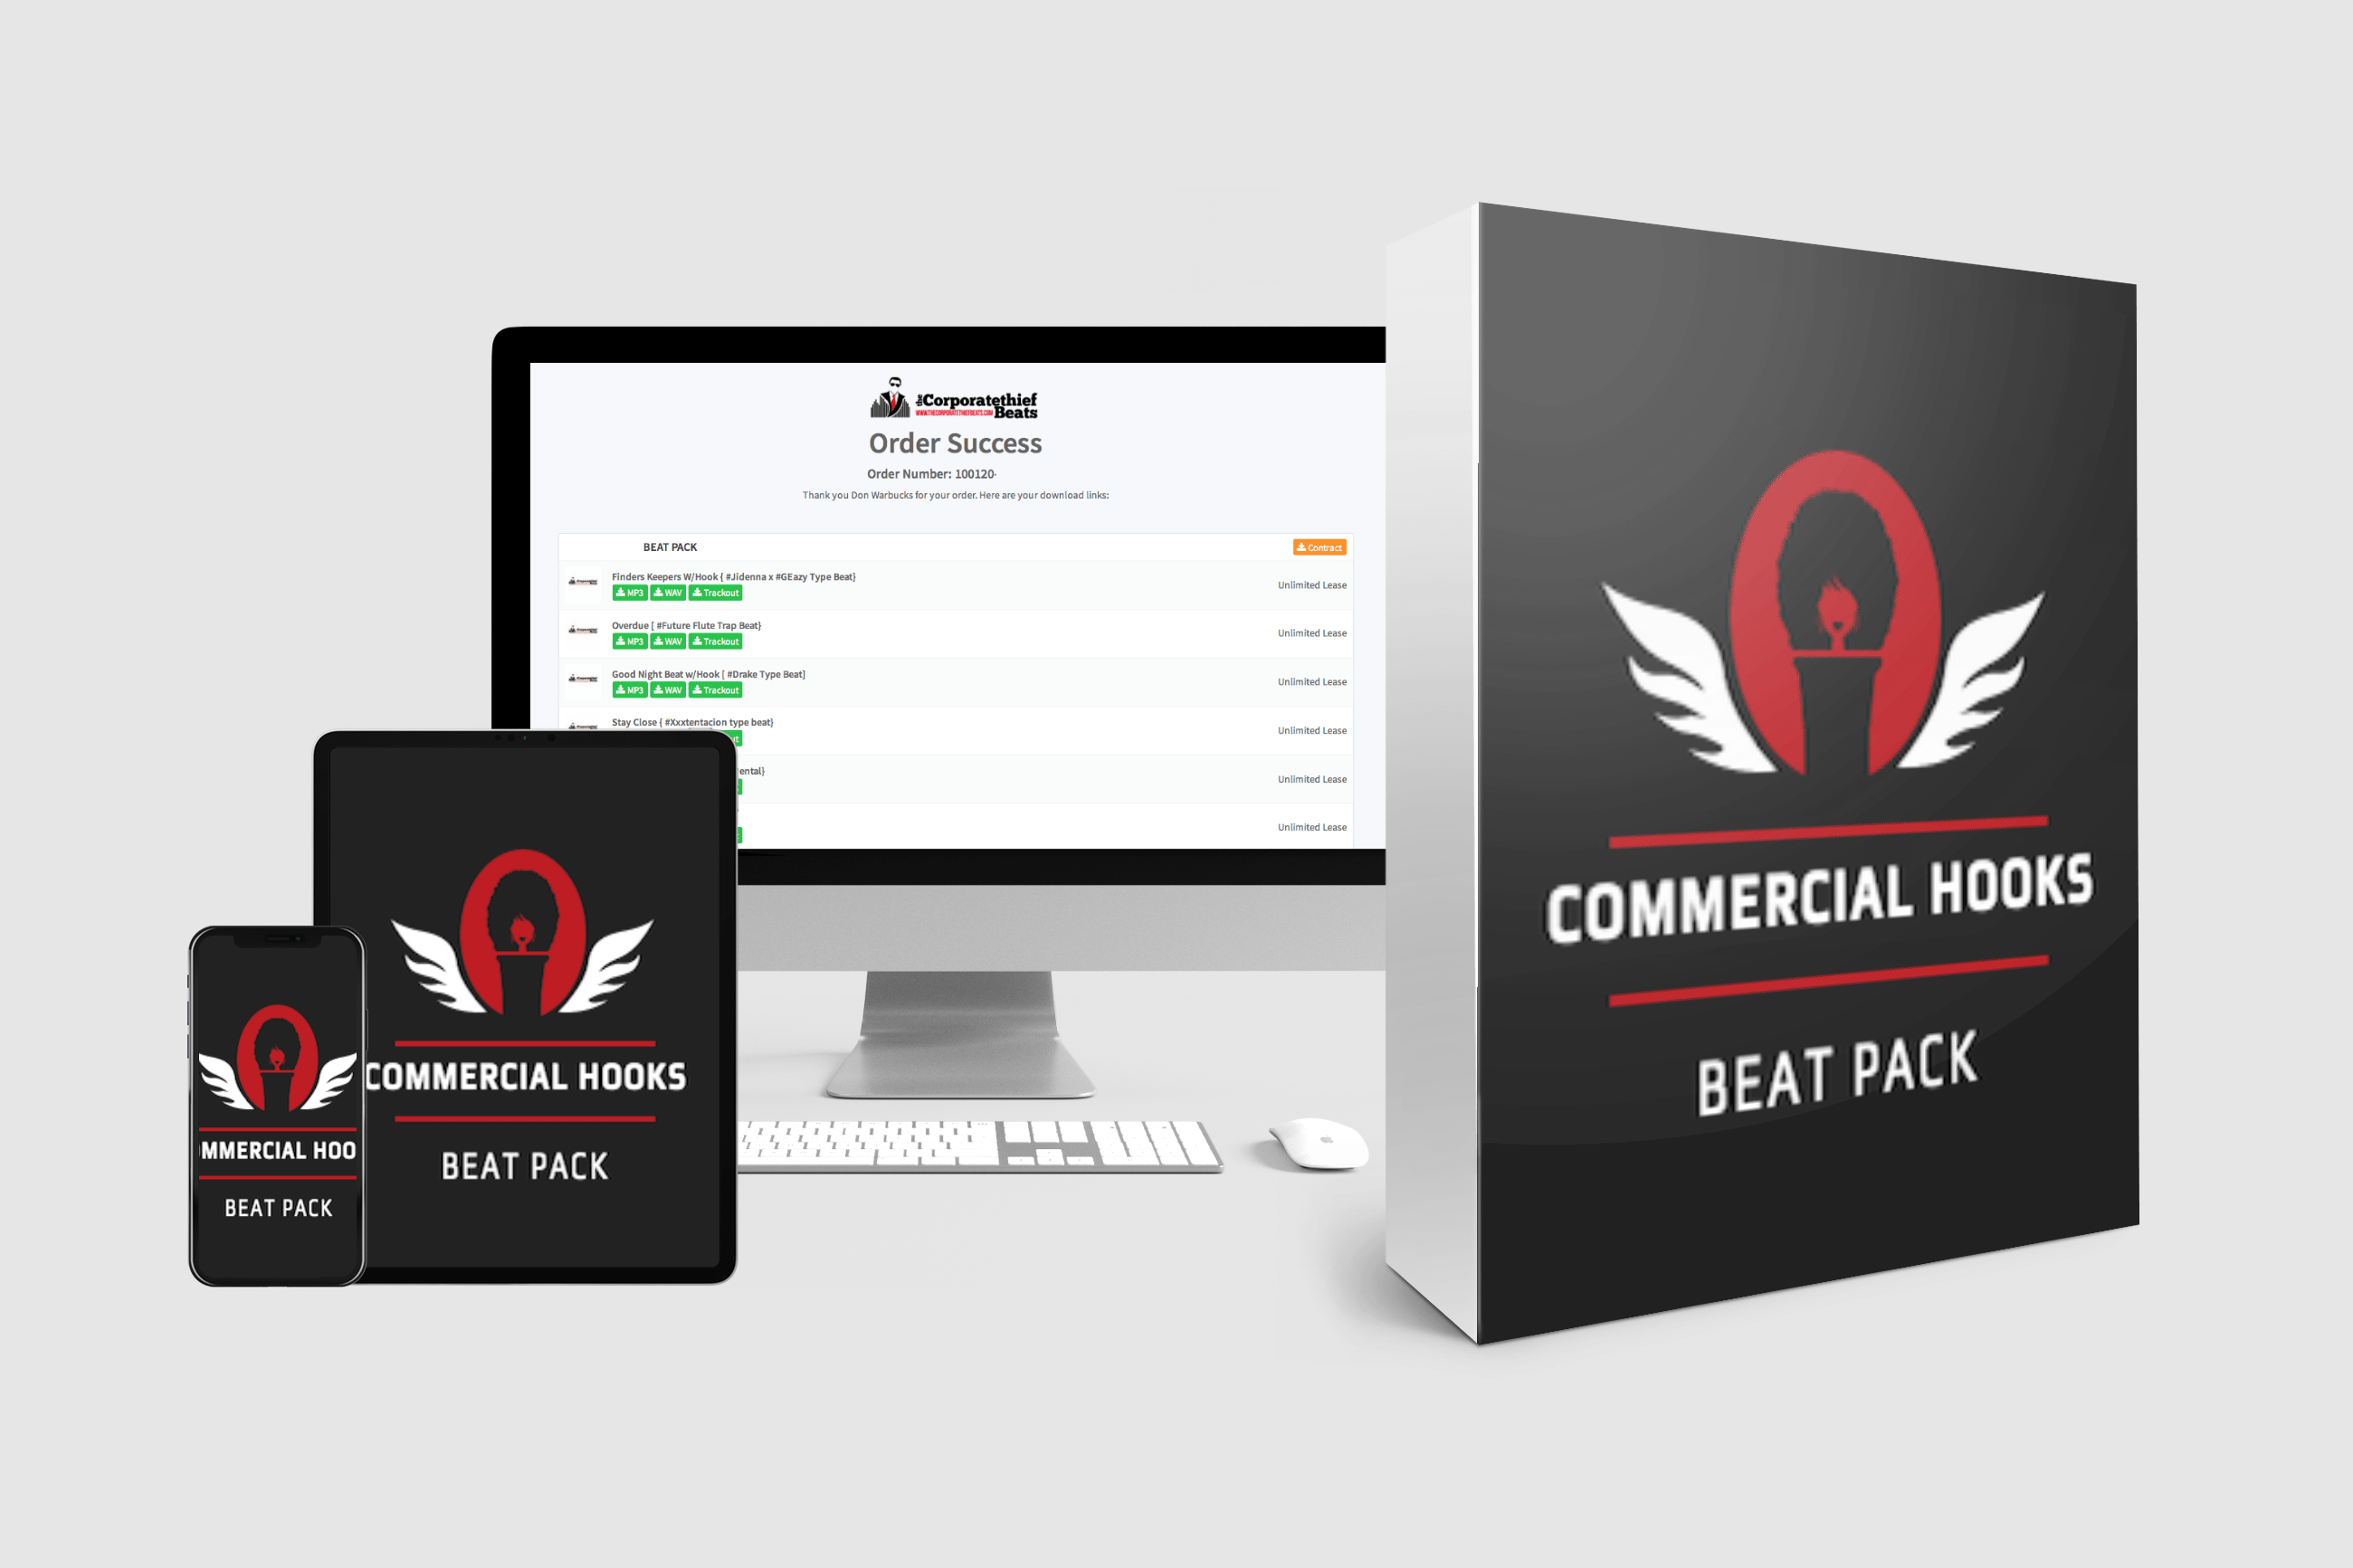 Commercial Hooks Beat Pack